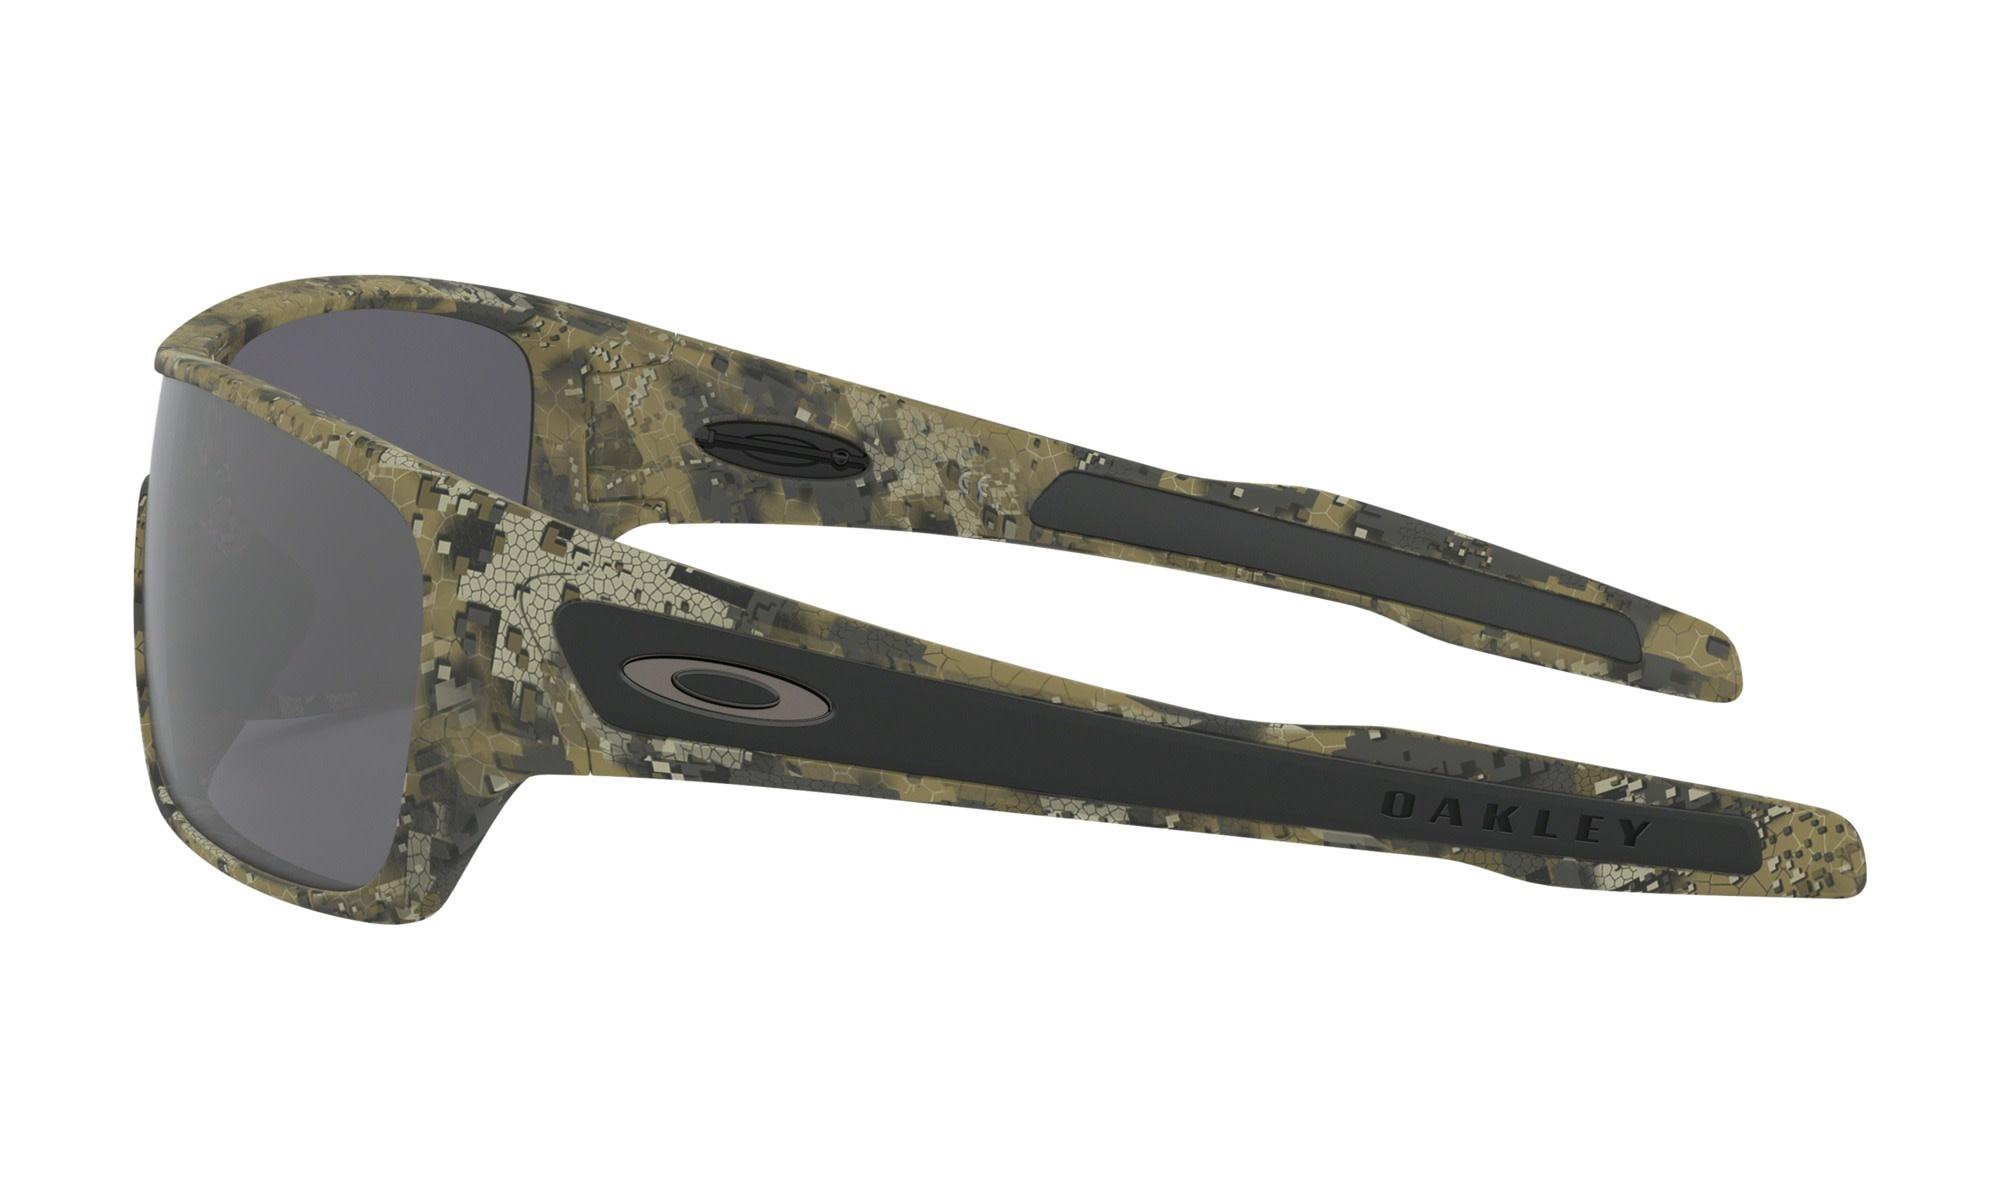 Oakley OAKLEY TURBINE ROTOR DESOLVE BARE CAMO W/ BLACK IRIDIUM POLARIZED